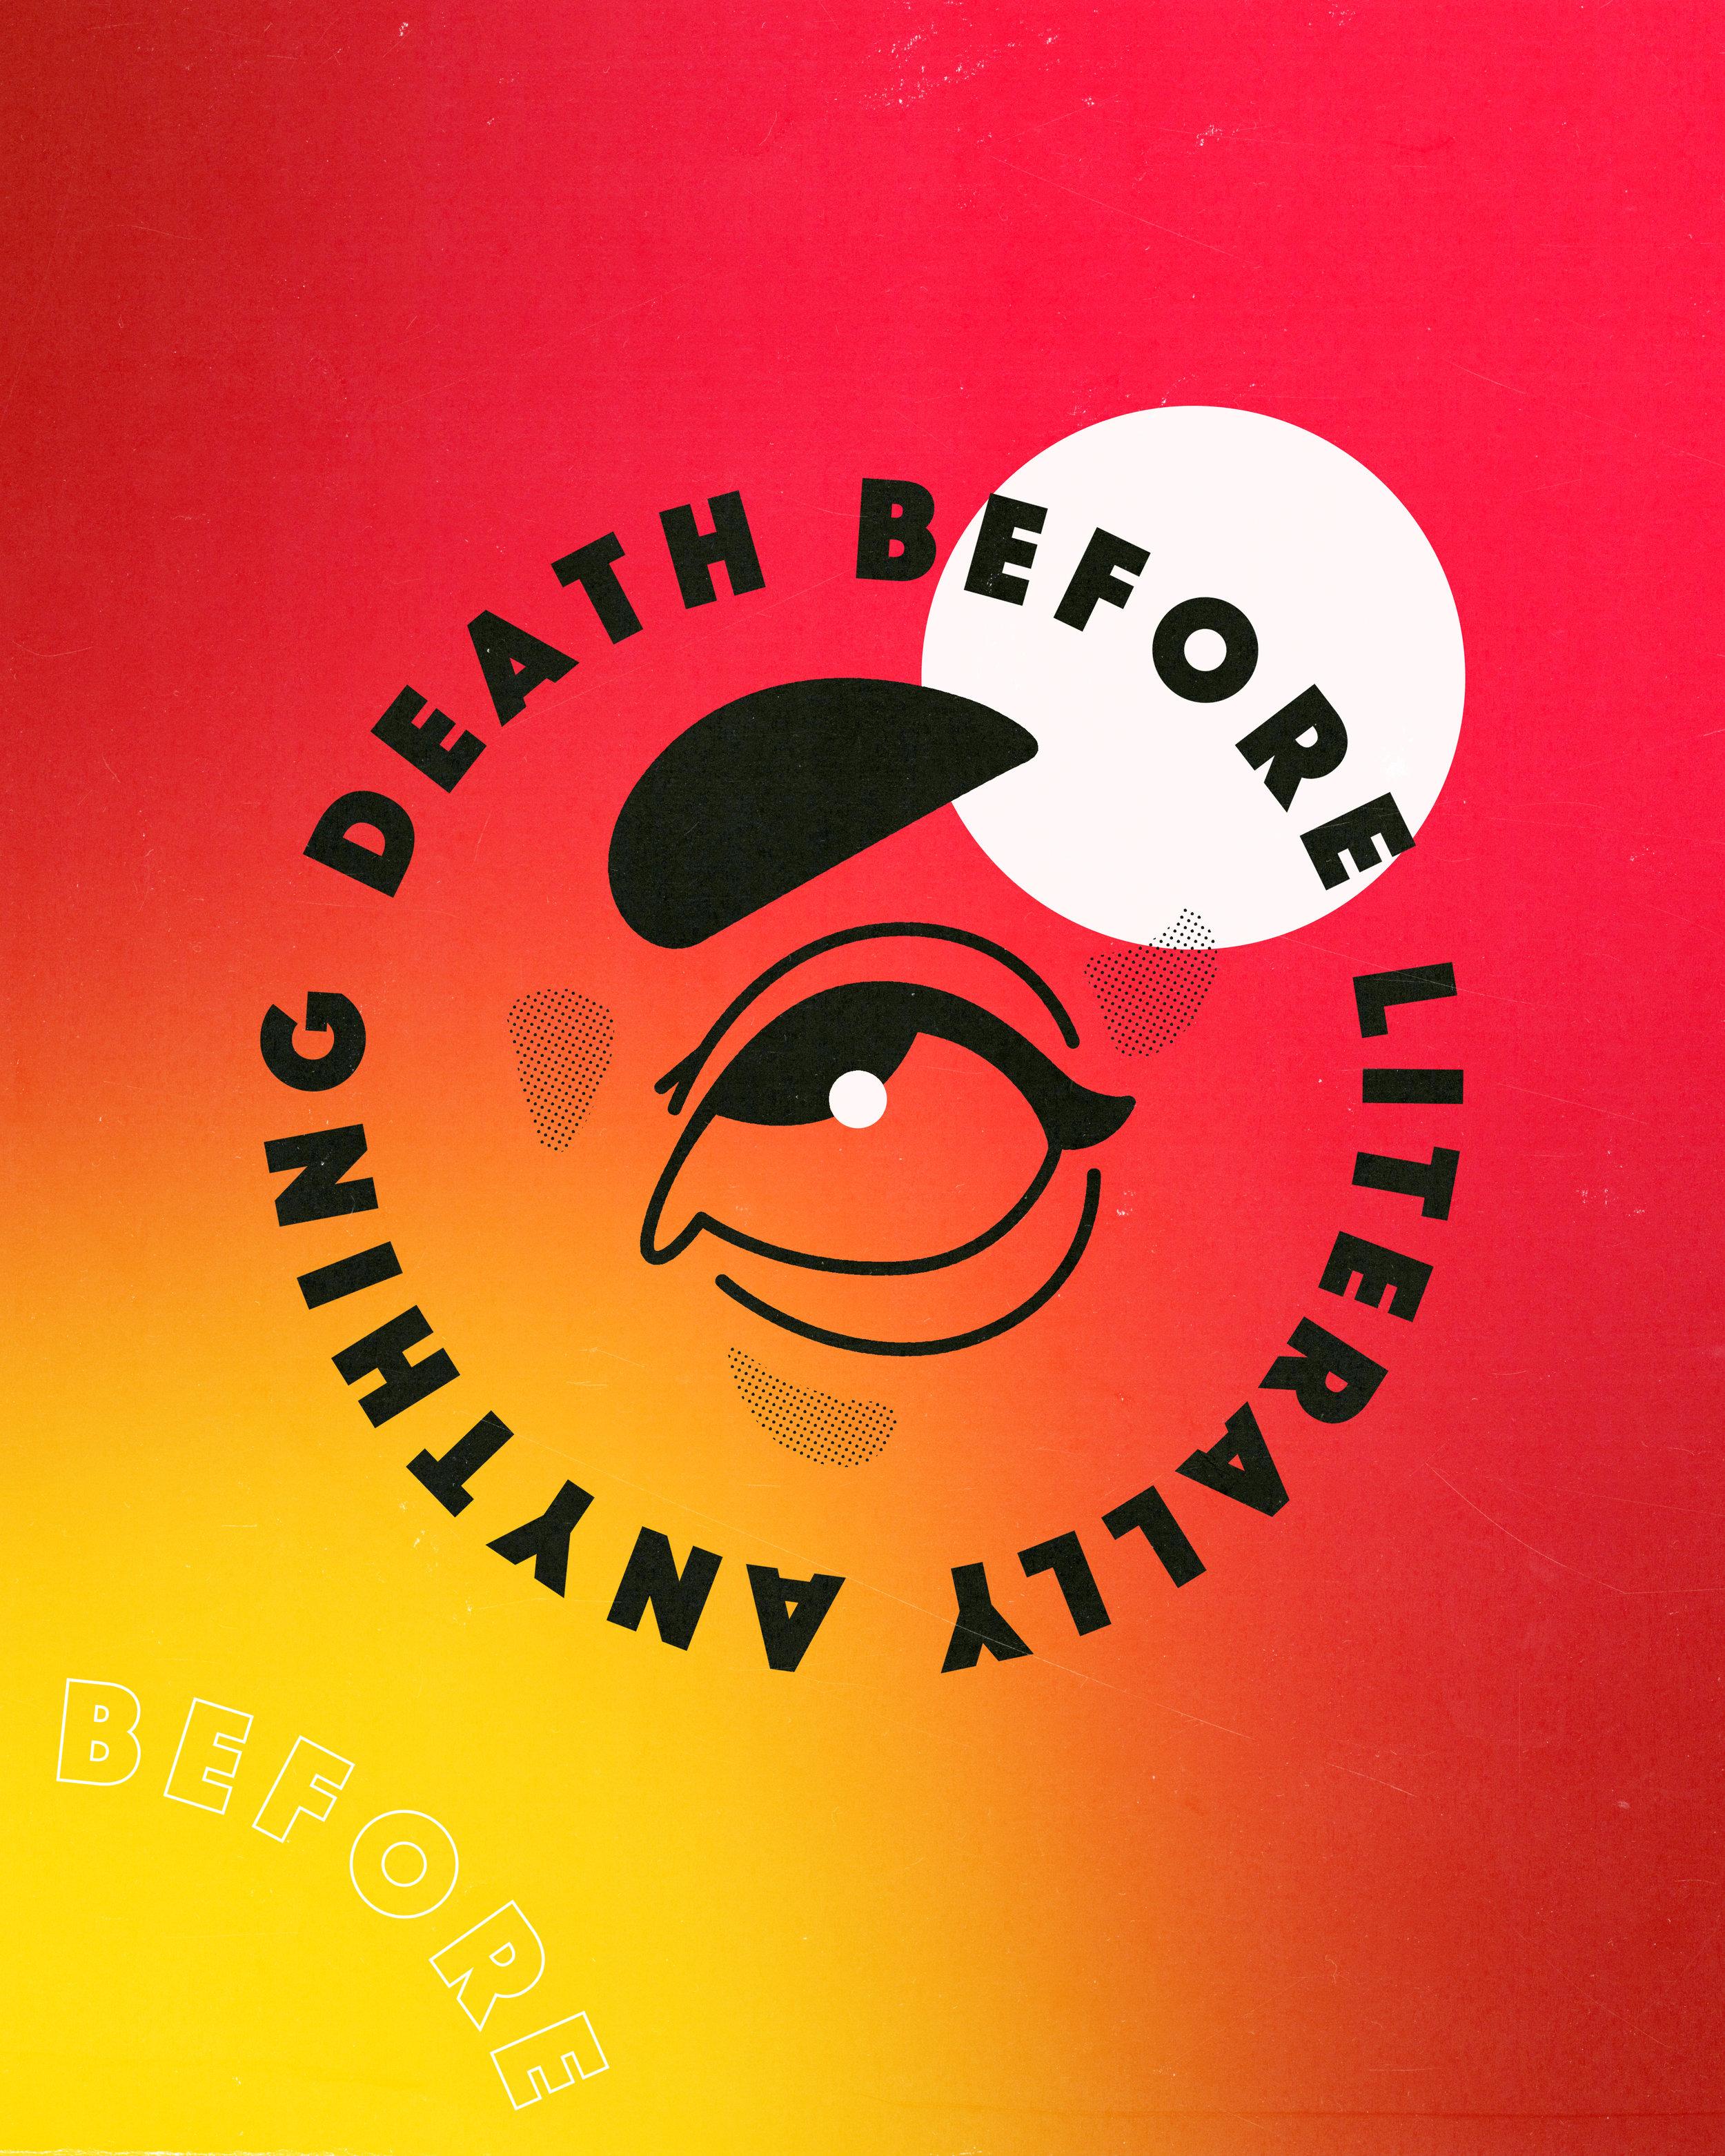 deathbeforegrad2.jpg